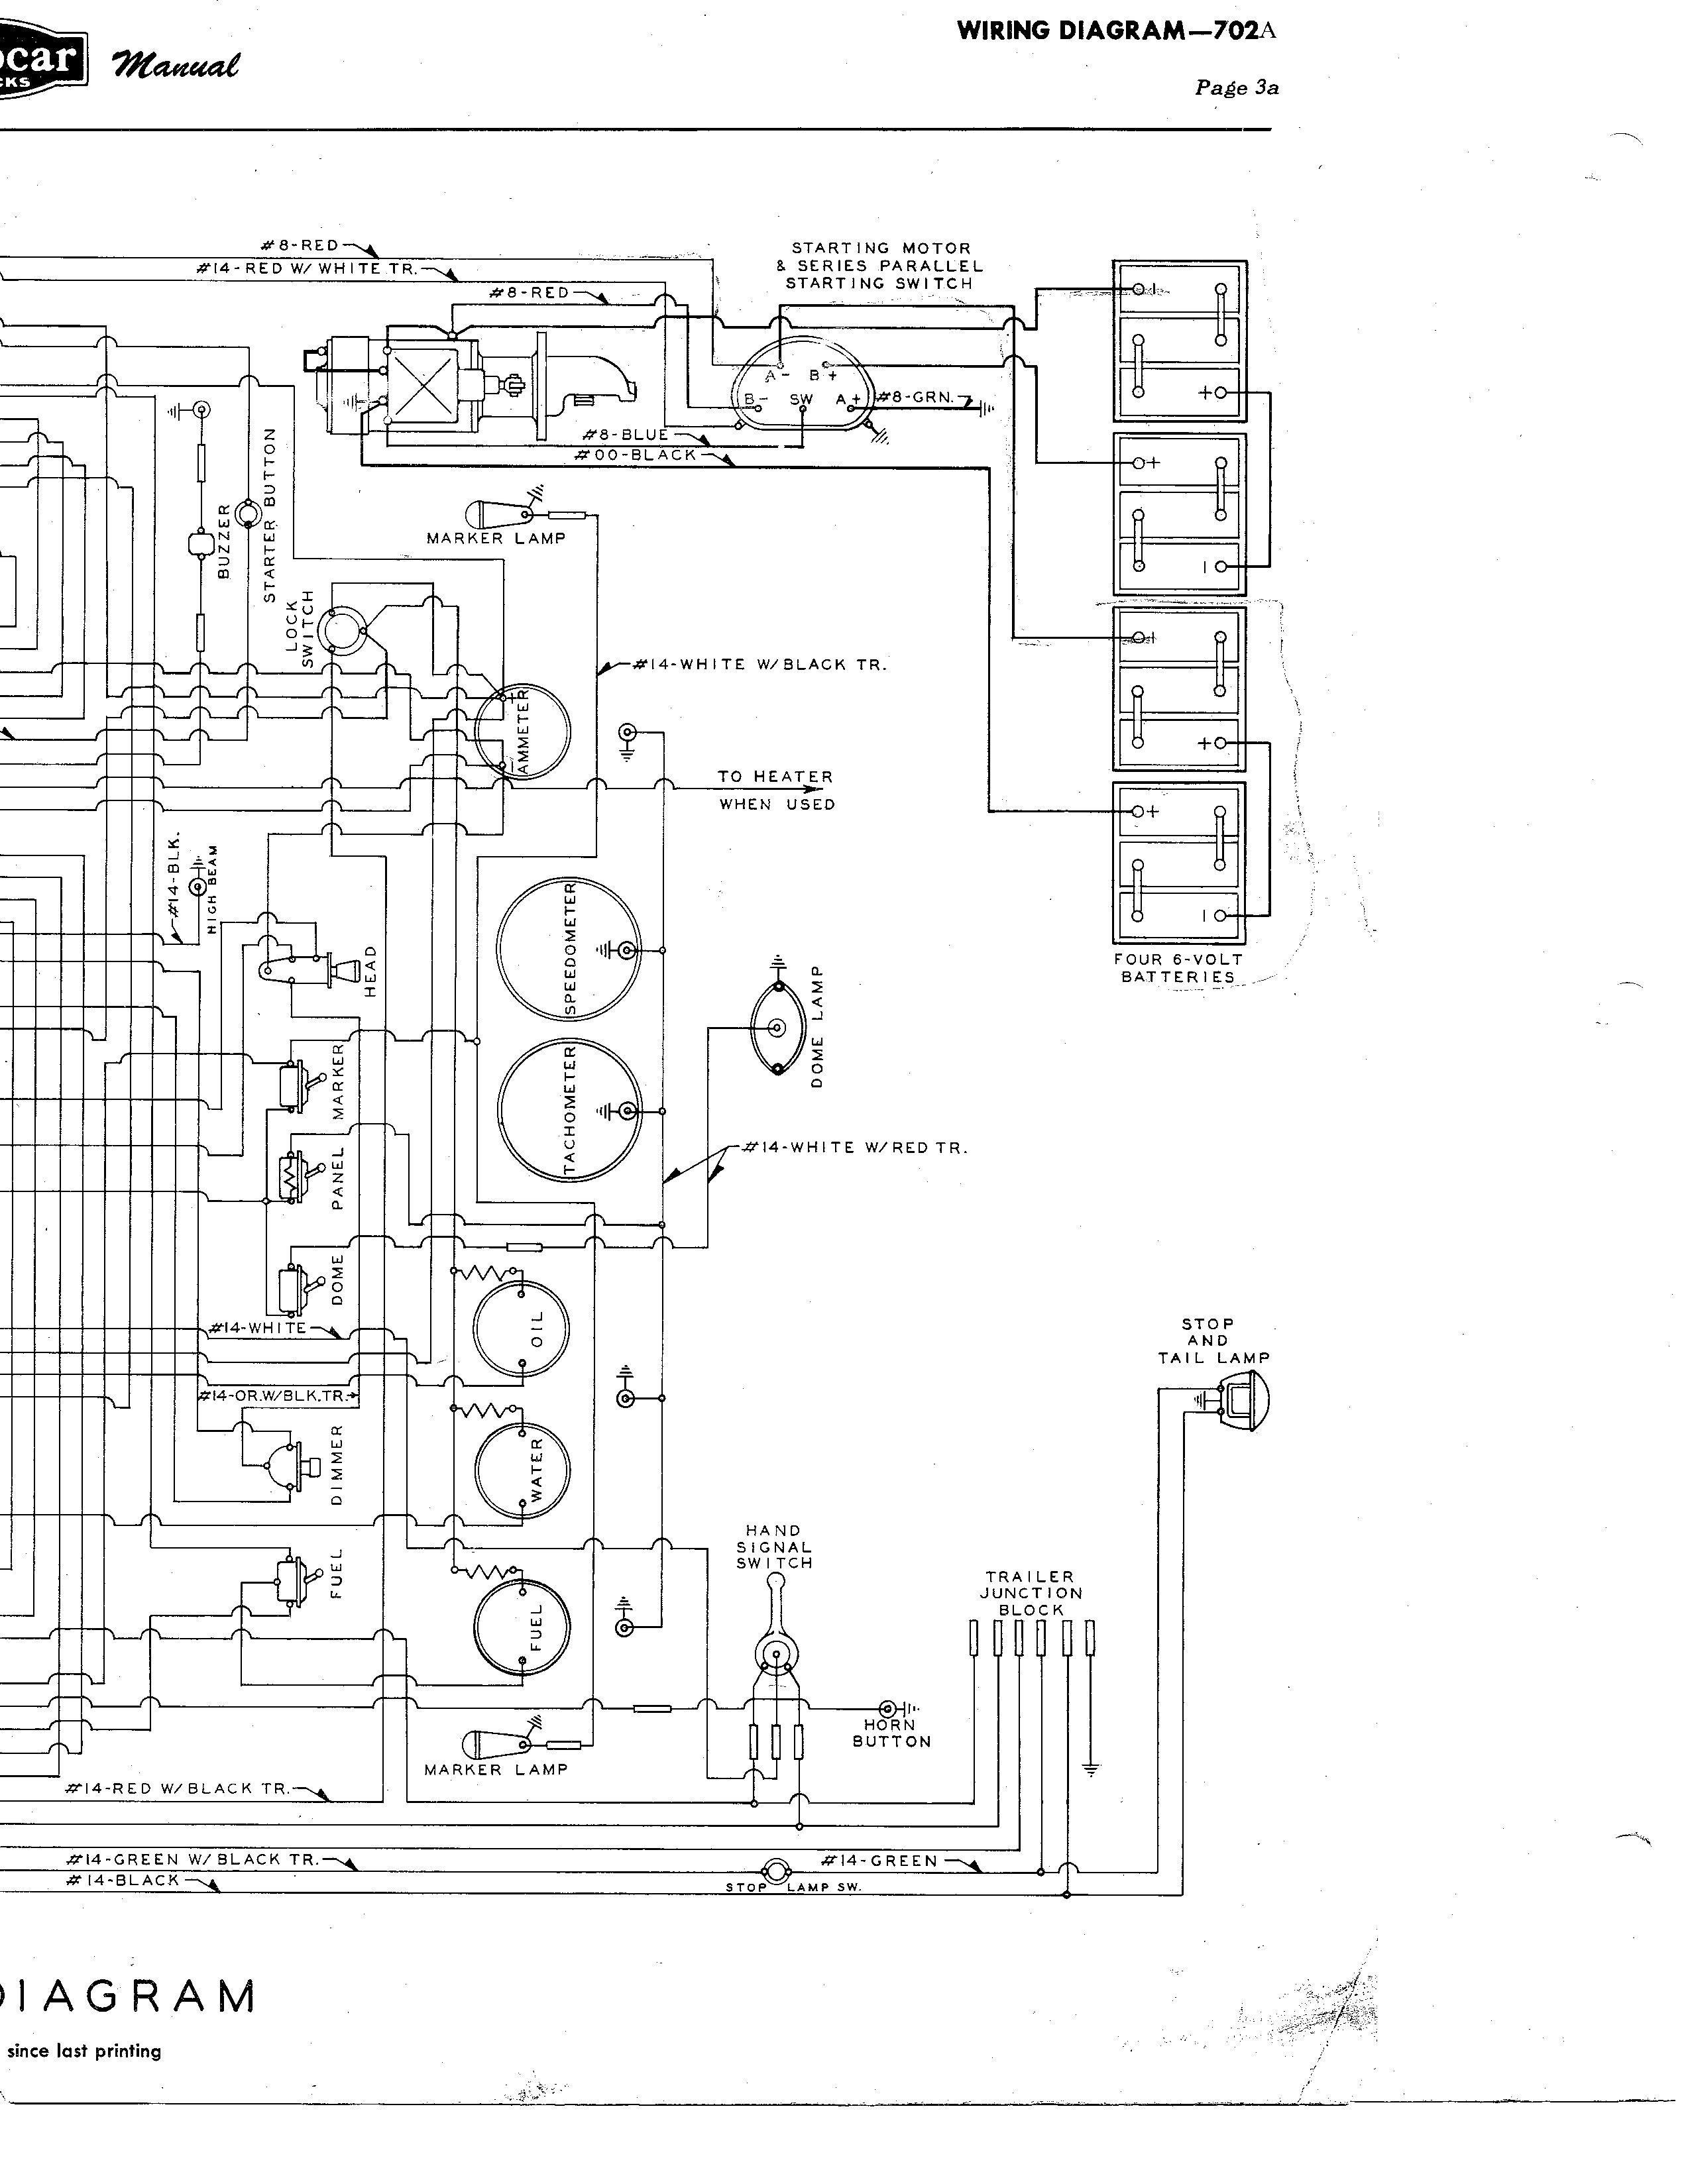 marmon truck wiring diagrams autocar truck wiring diagrams wiring diagram schematic  autocar truck wiring diagrams wiring